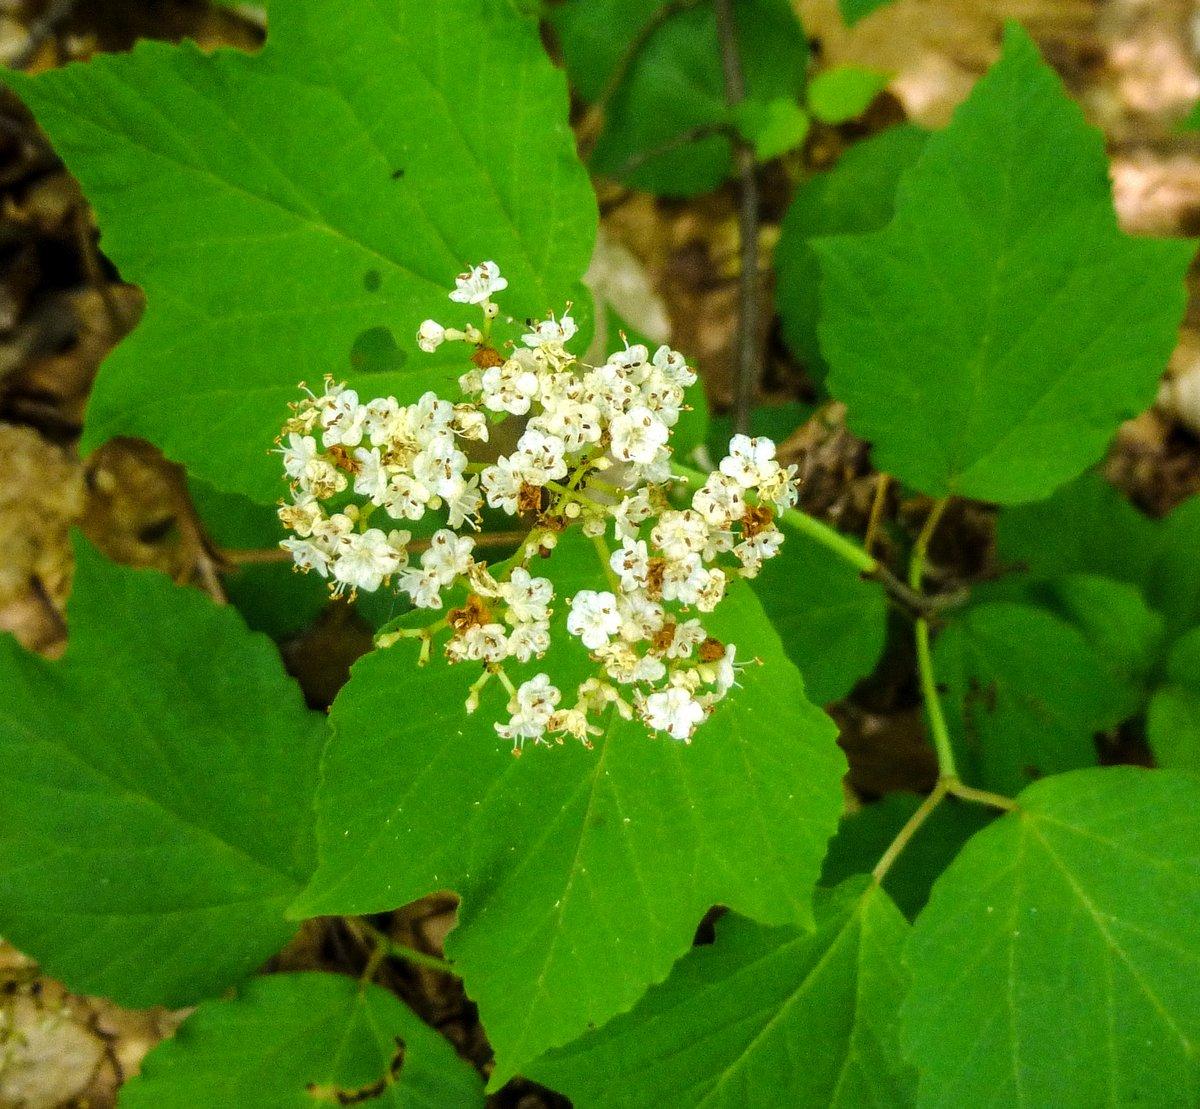 5. Maple Leaf Viburnum